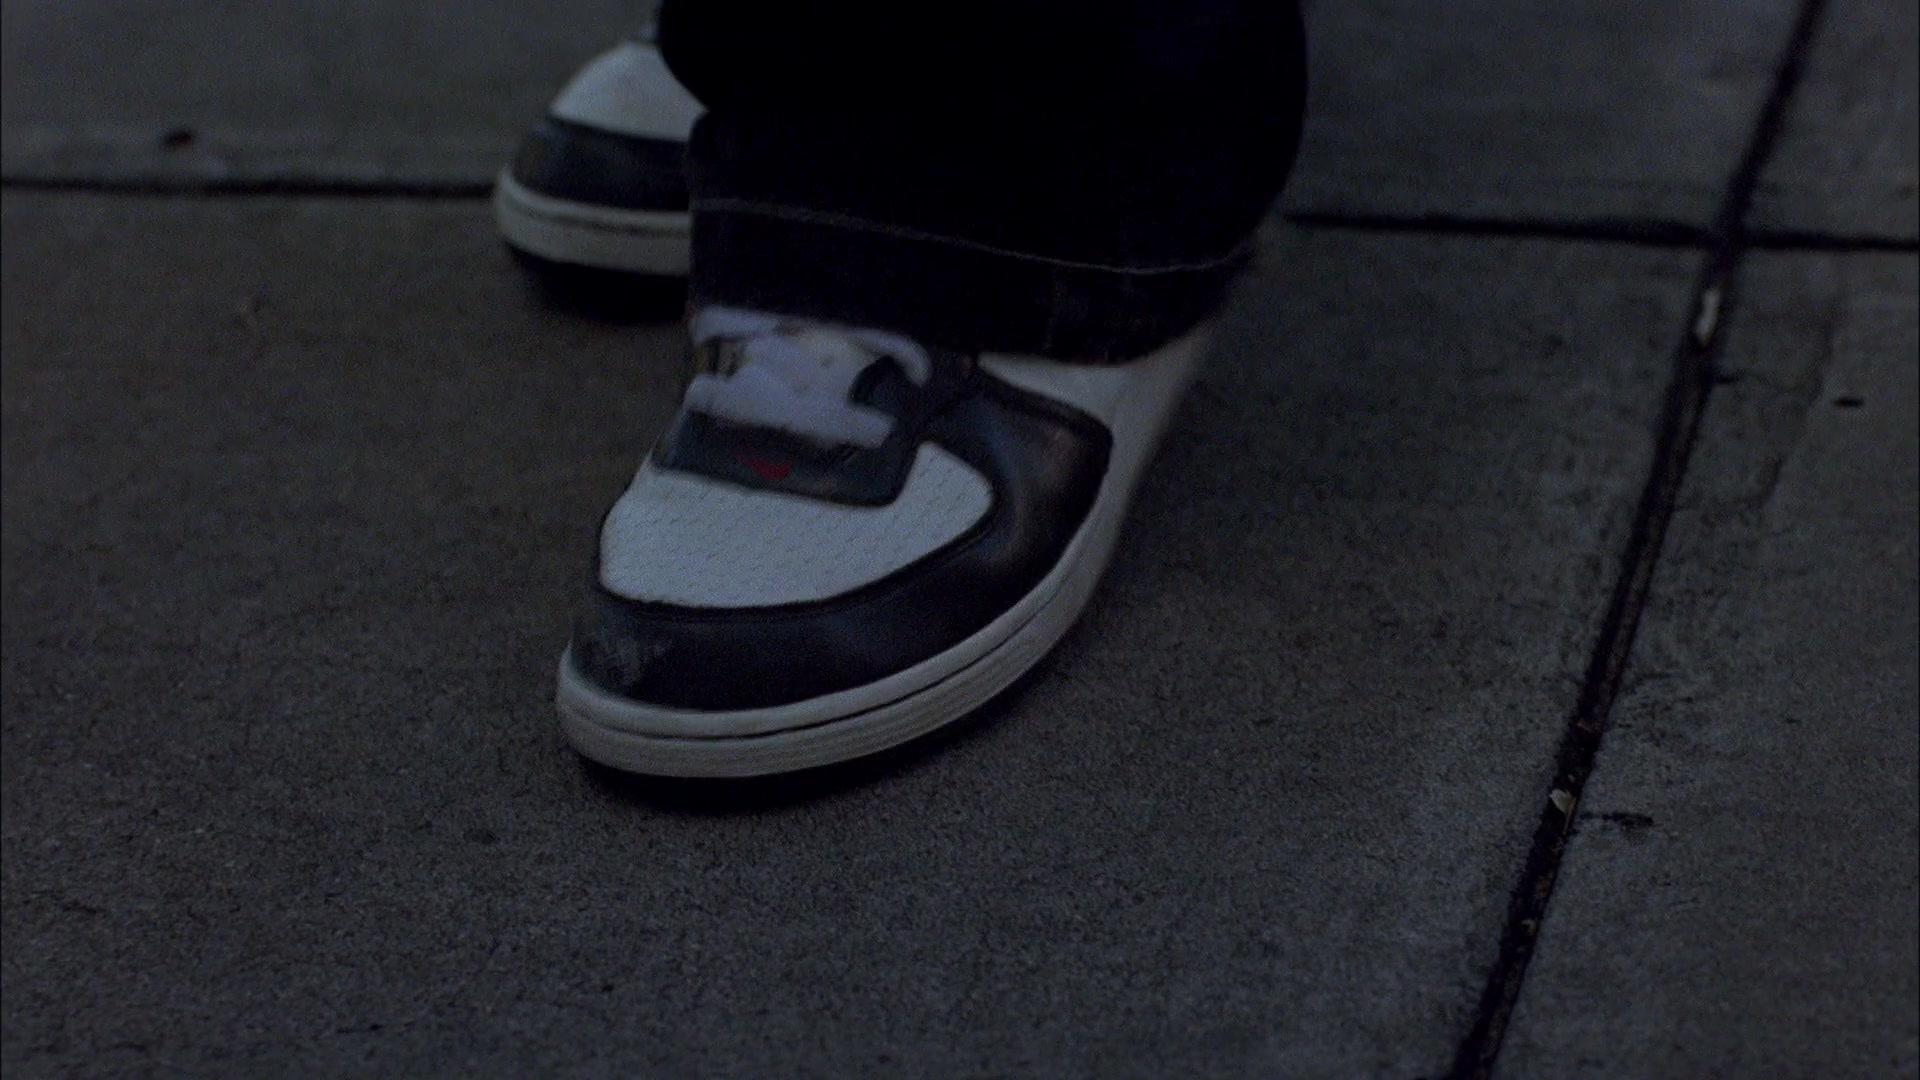 Nike Sneakers Worn by Aaron Paul (Jesse Pinkman) in